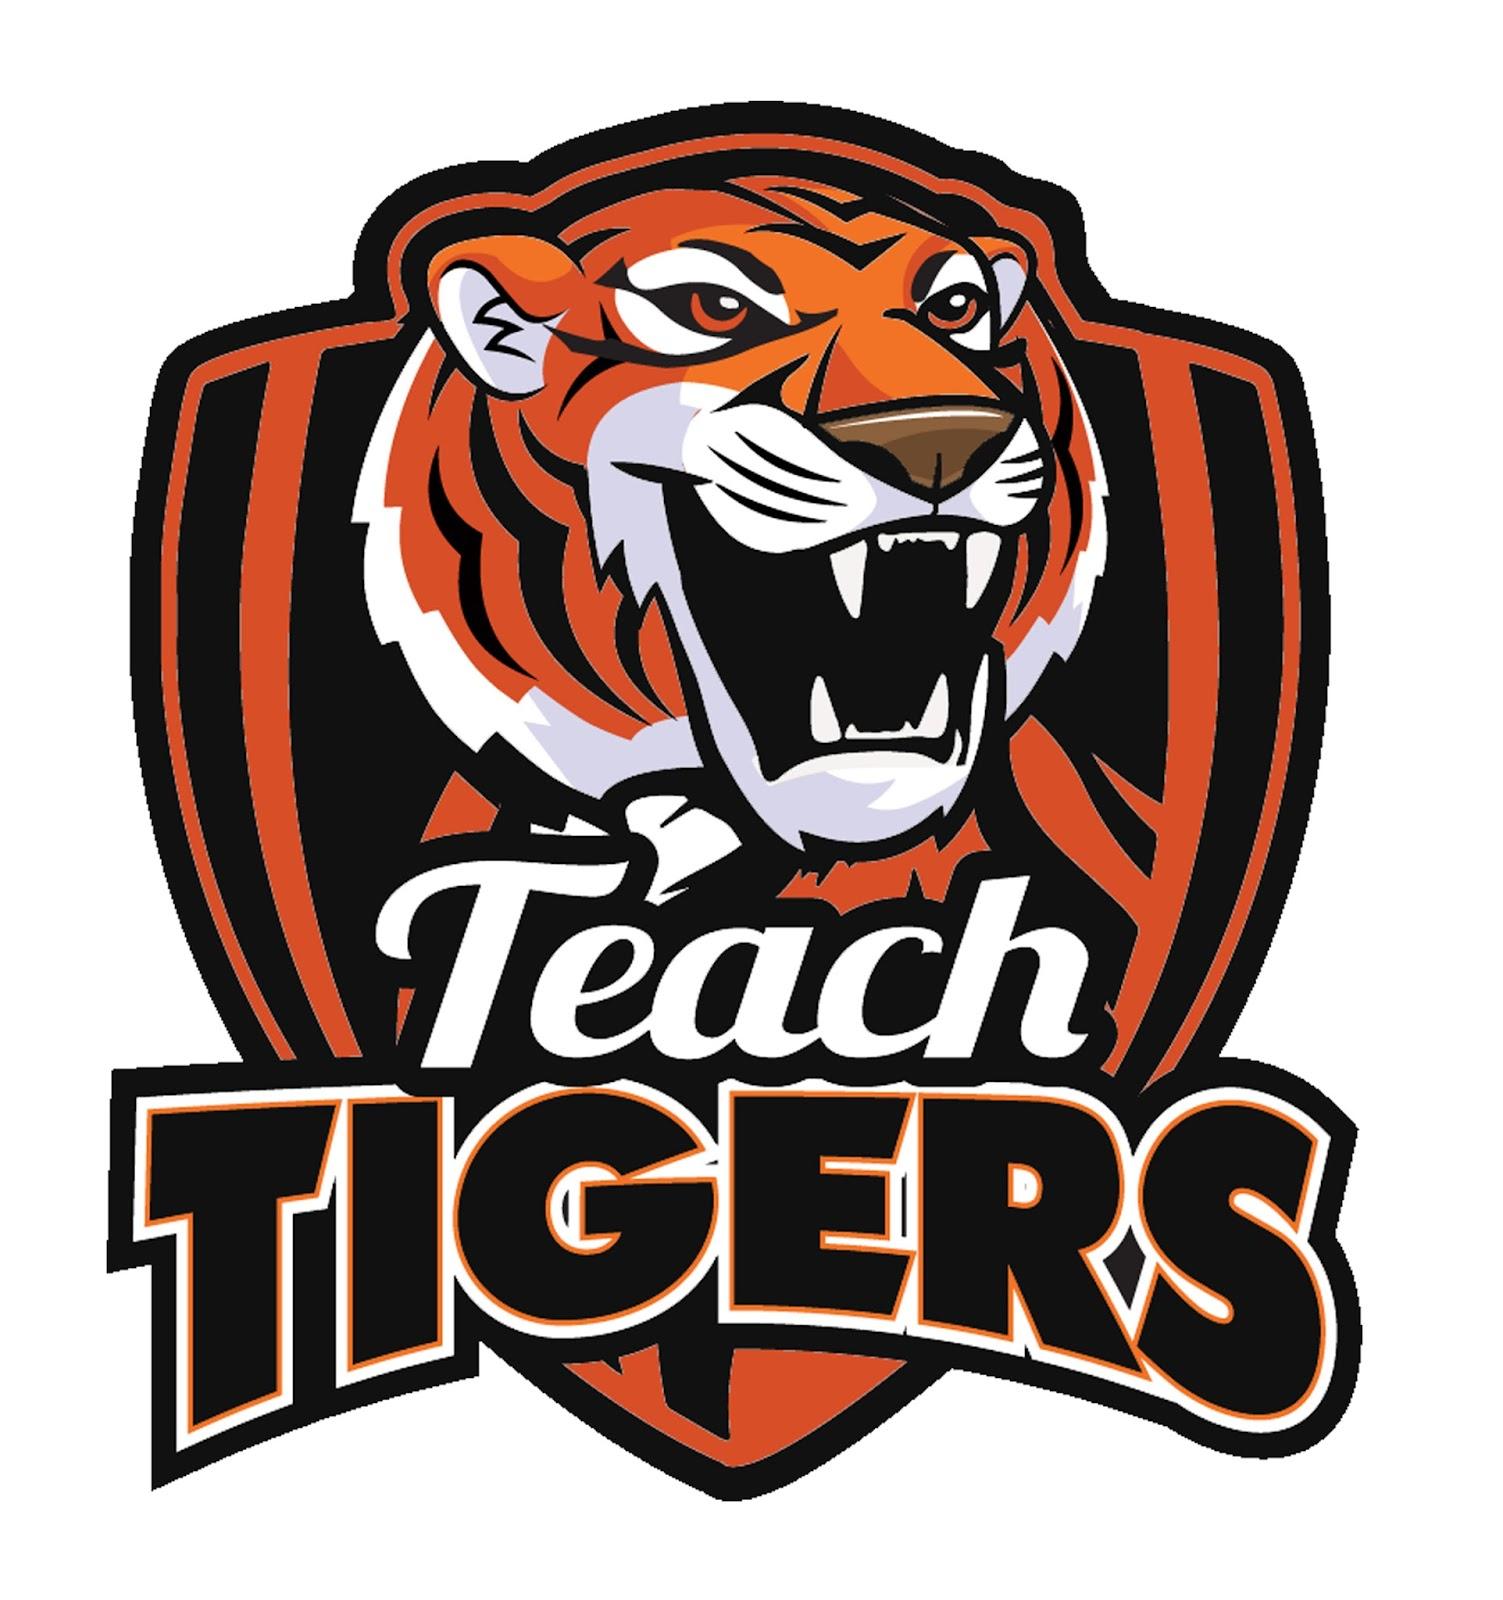 Teach Tiger logo 2017 color.JPG